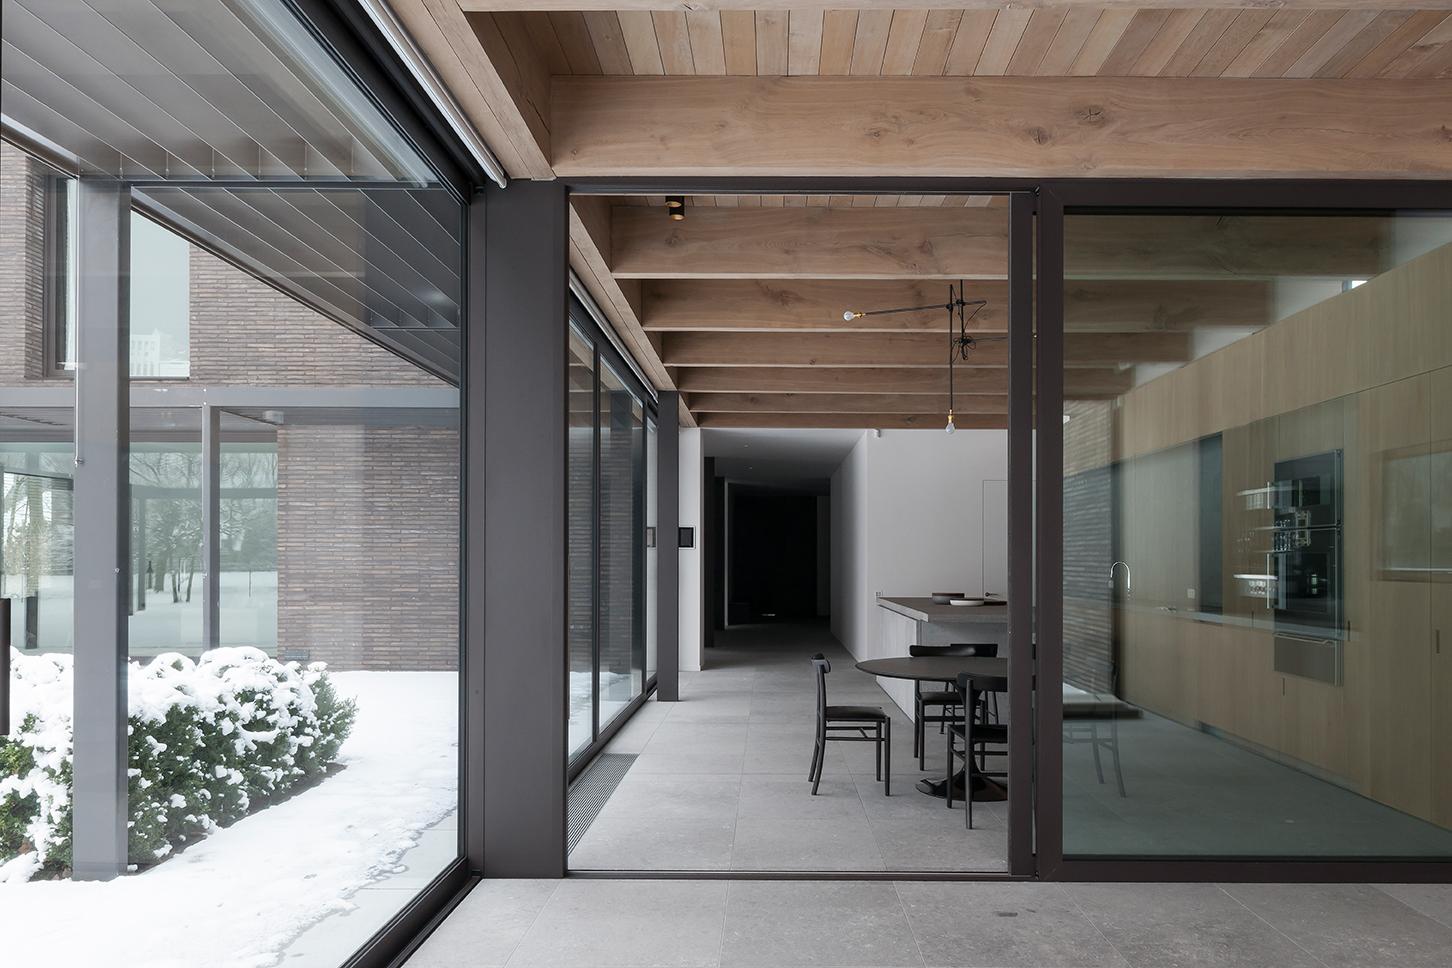 eggermont natuursteen dd residence. Black Bedroom Furniture Sets. Home Design Ideas